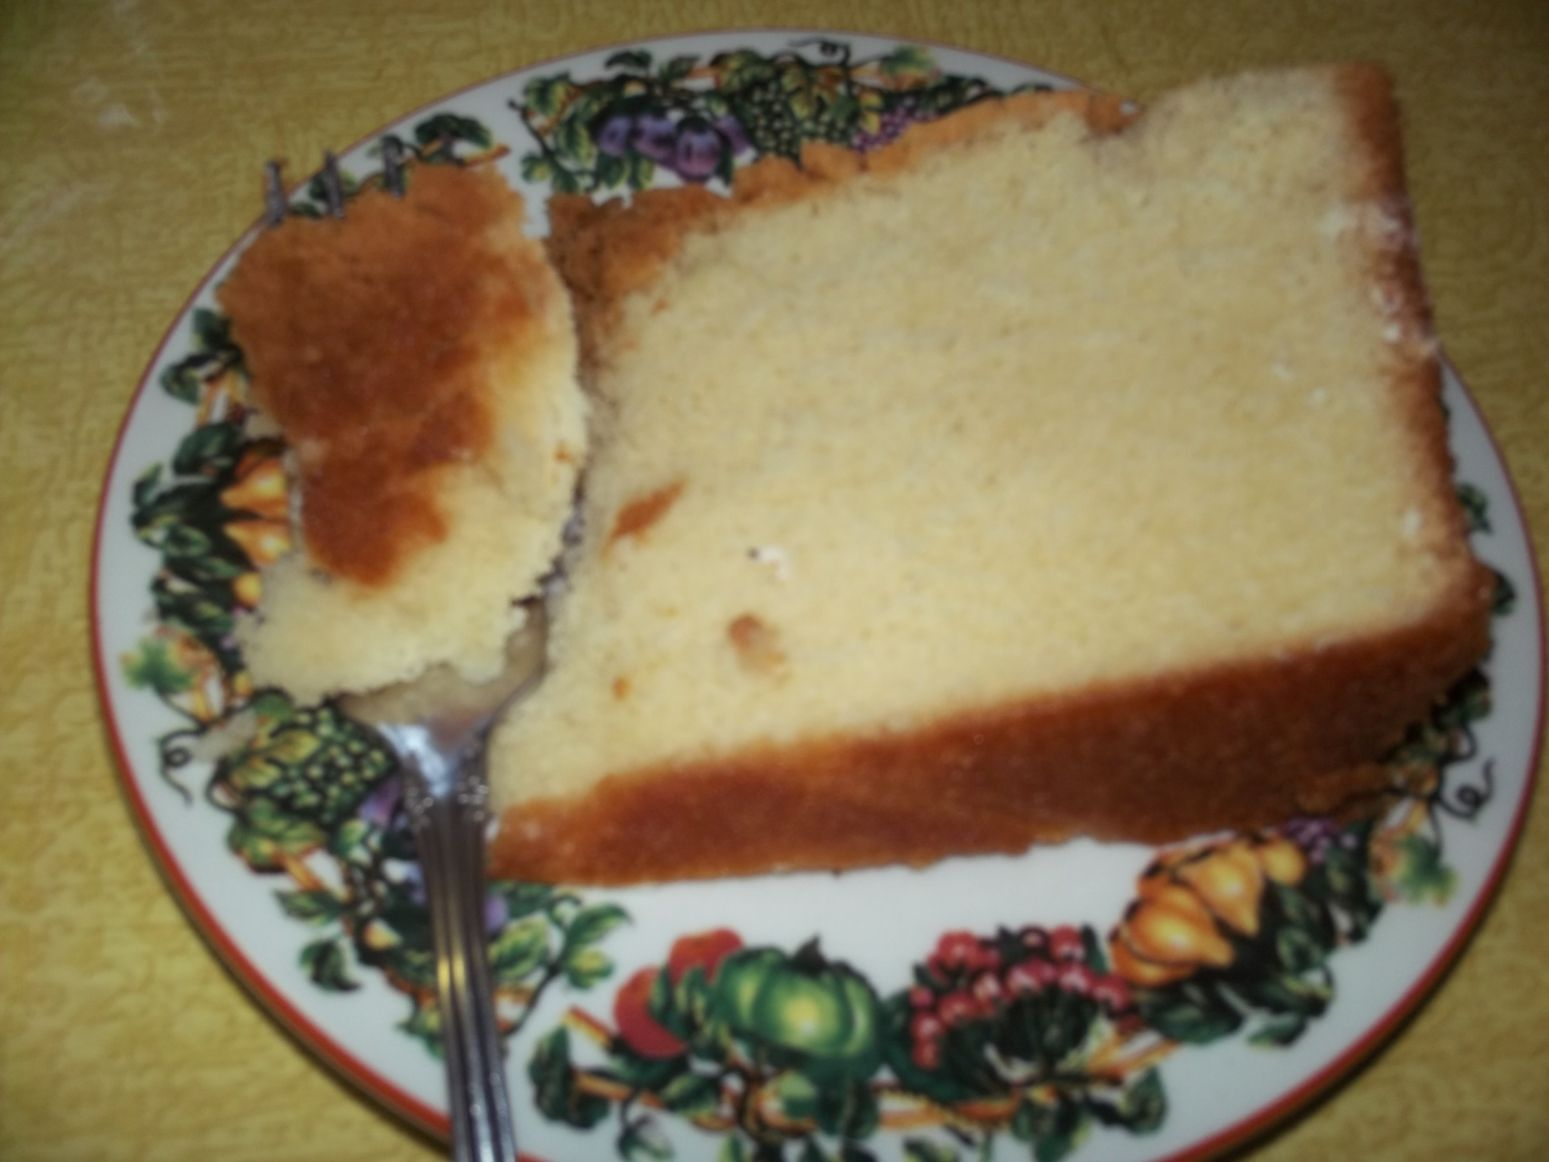 Light Airy Pound Cake Cake Recipe With Self Rising Flour Pound Cake Recipes Self Rising Flour